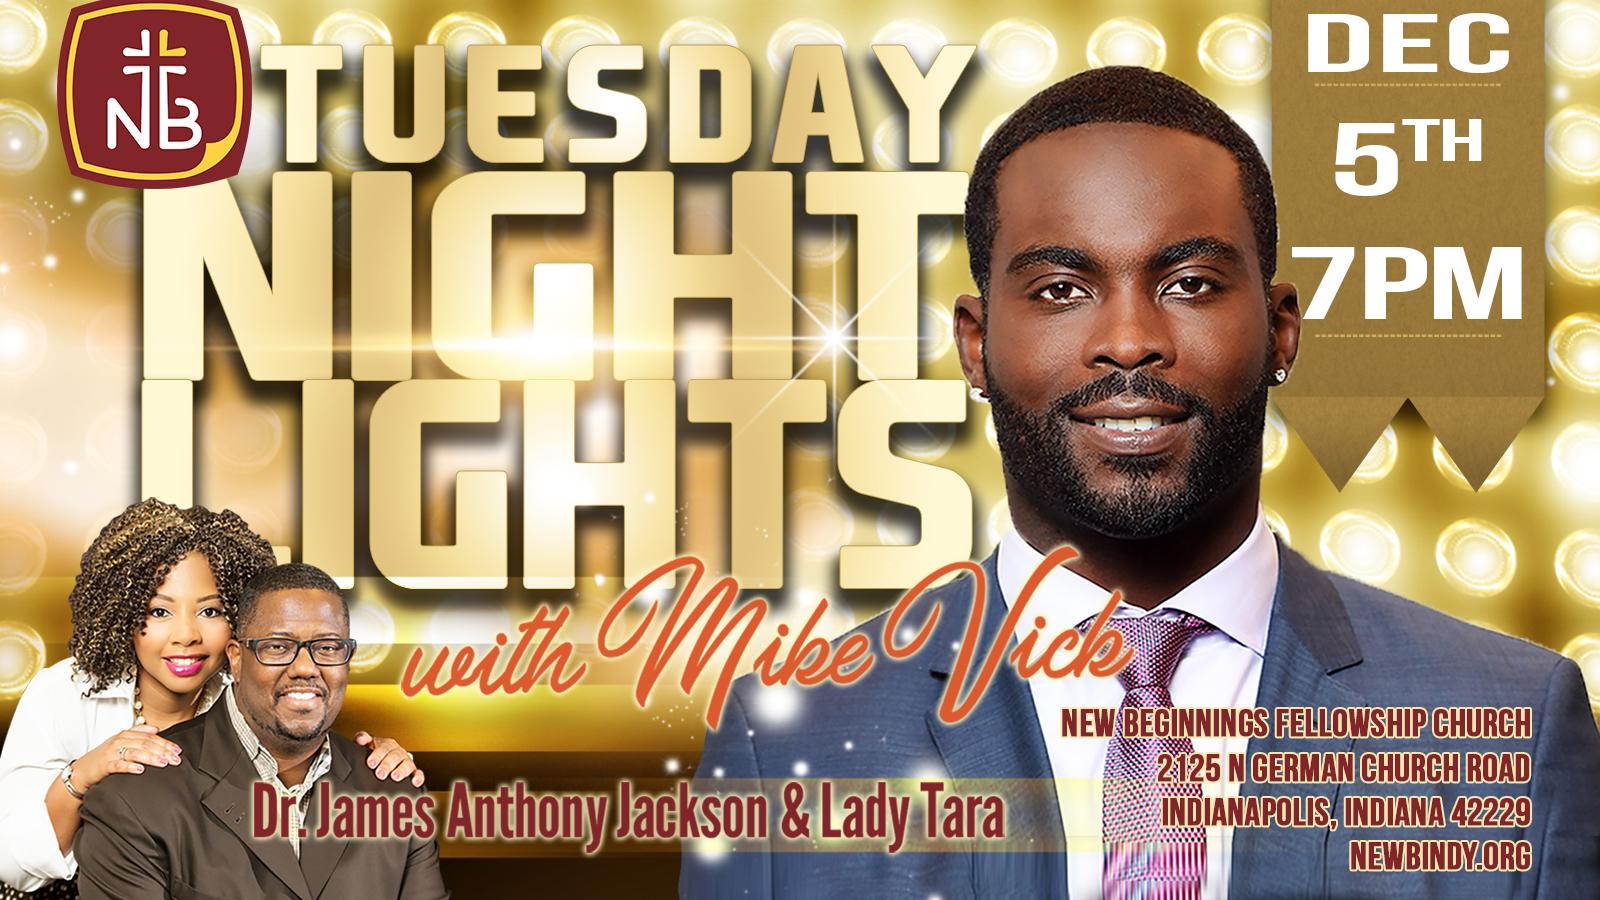 Thursday Night Lights w/ Mike Vick Flyer